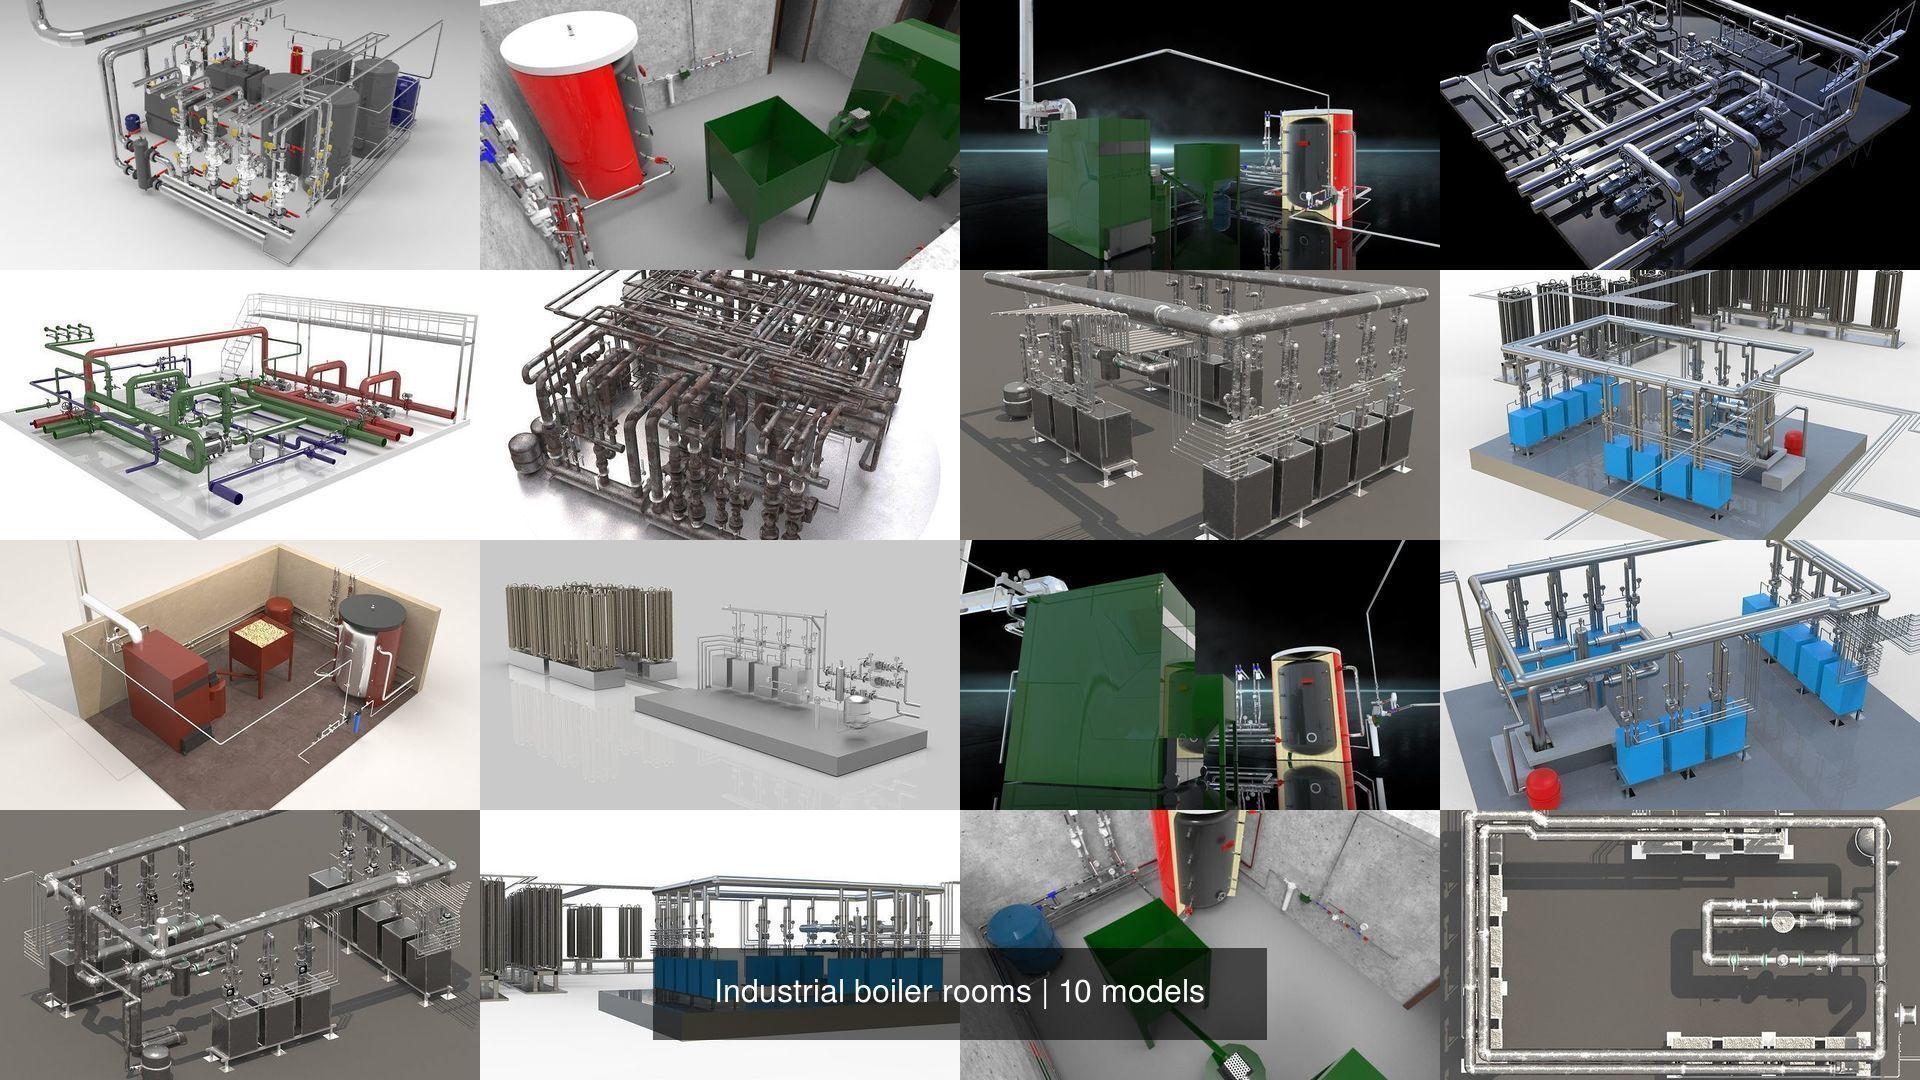 Industrial boiler rooms